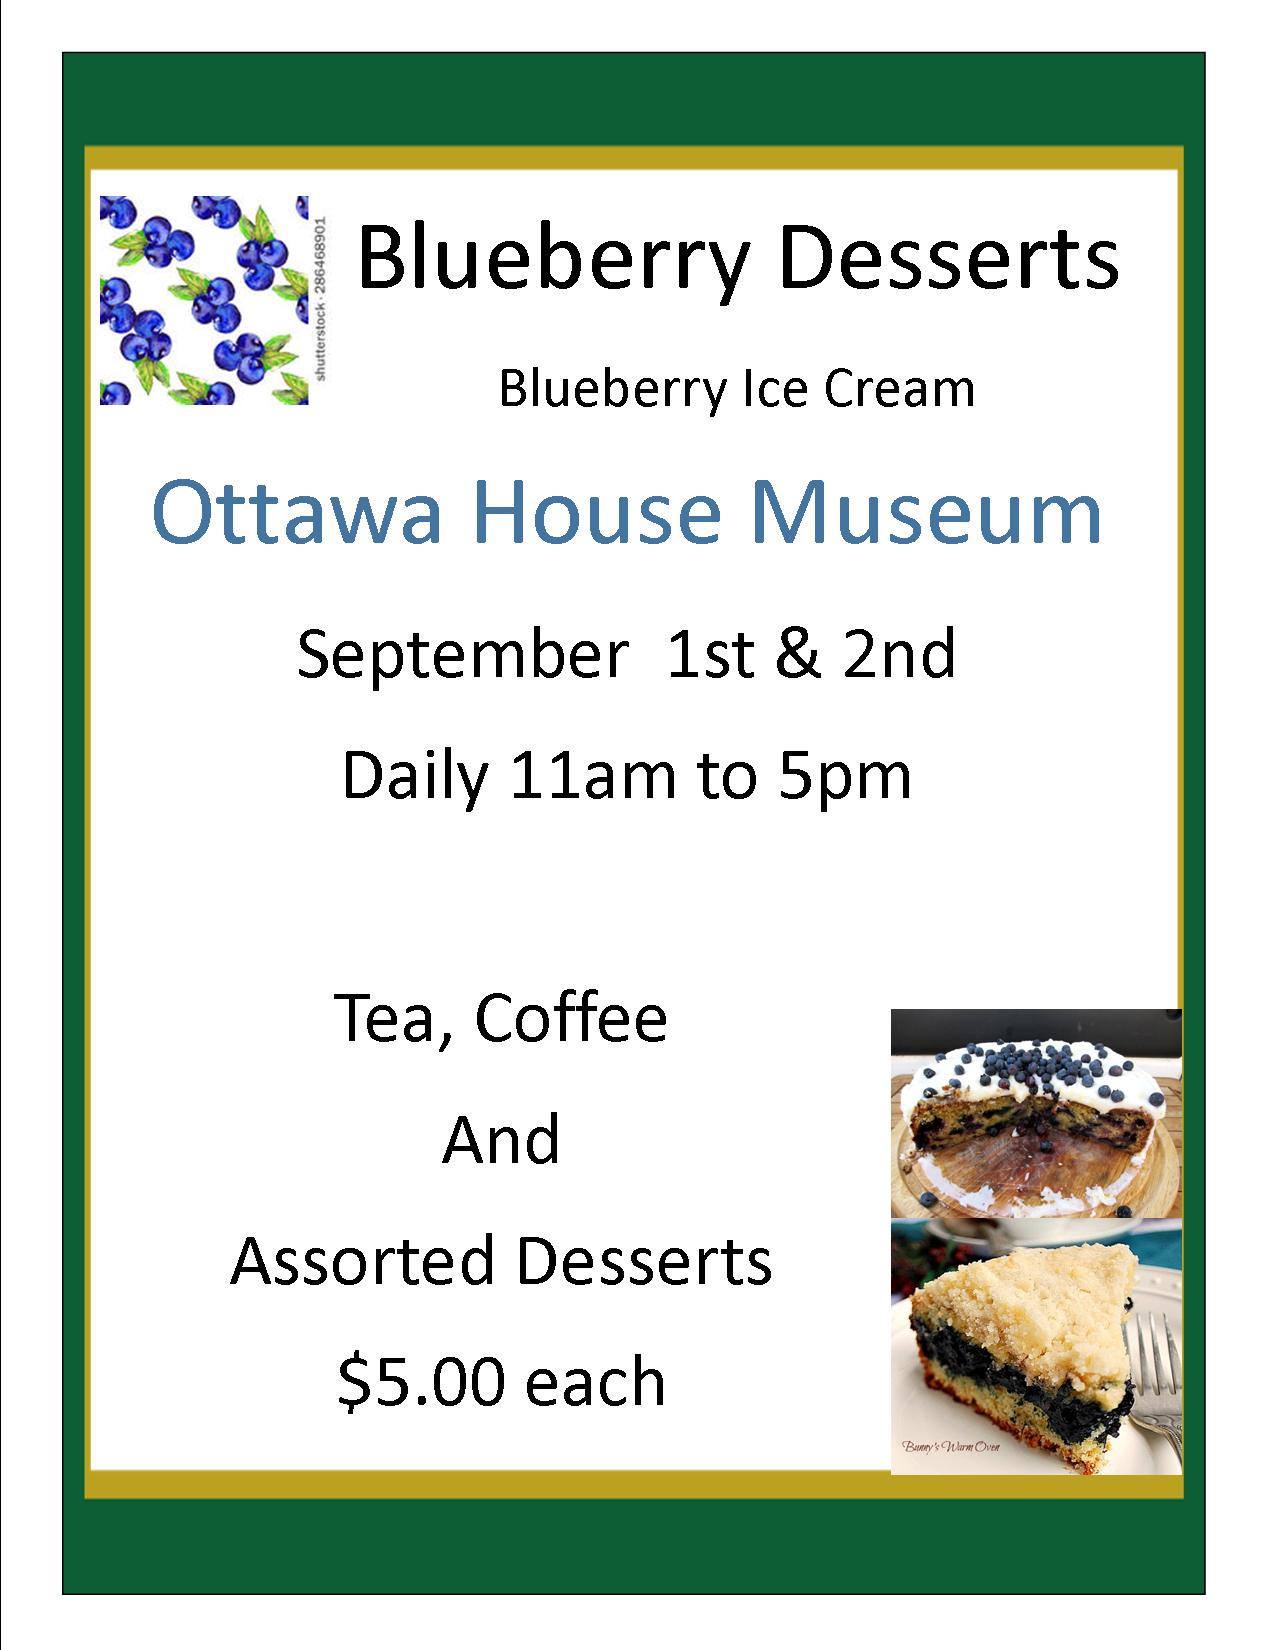 Blueberry Desserts 2018